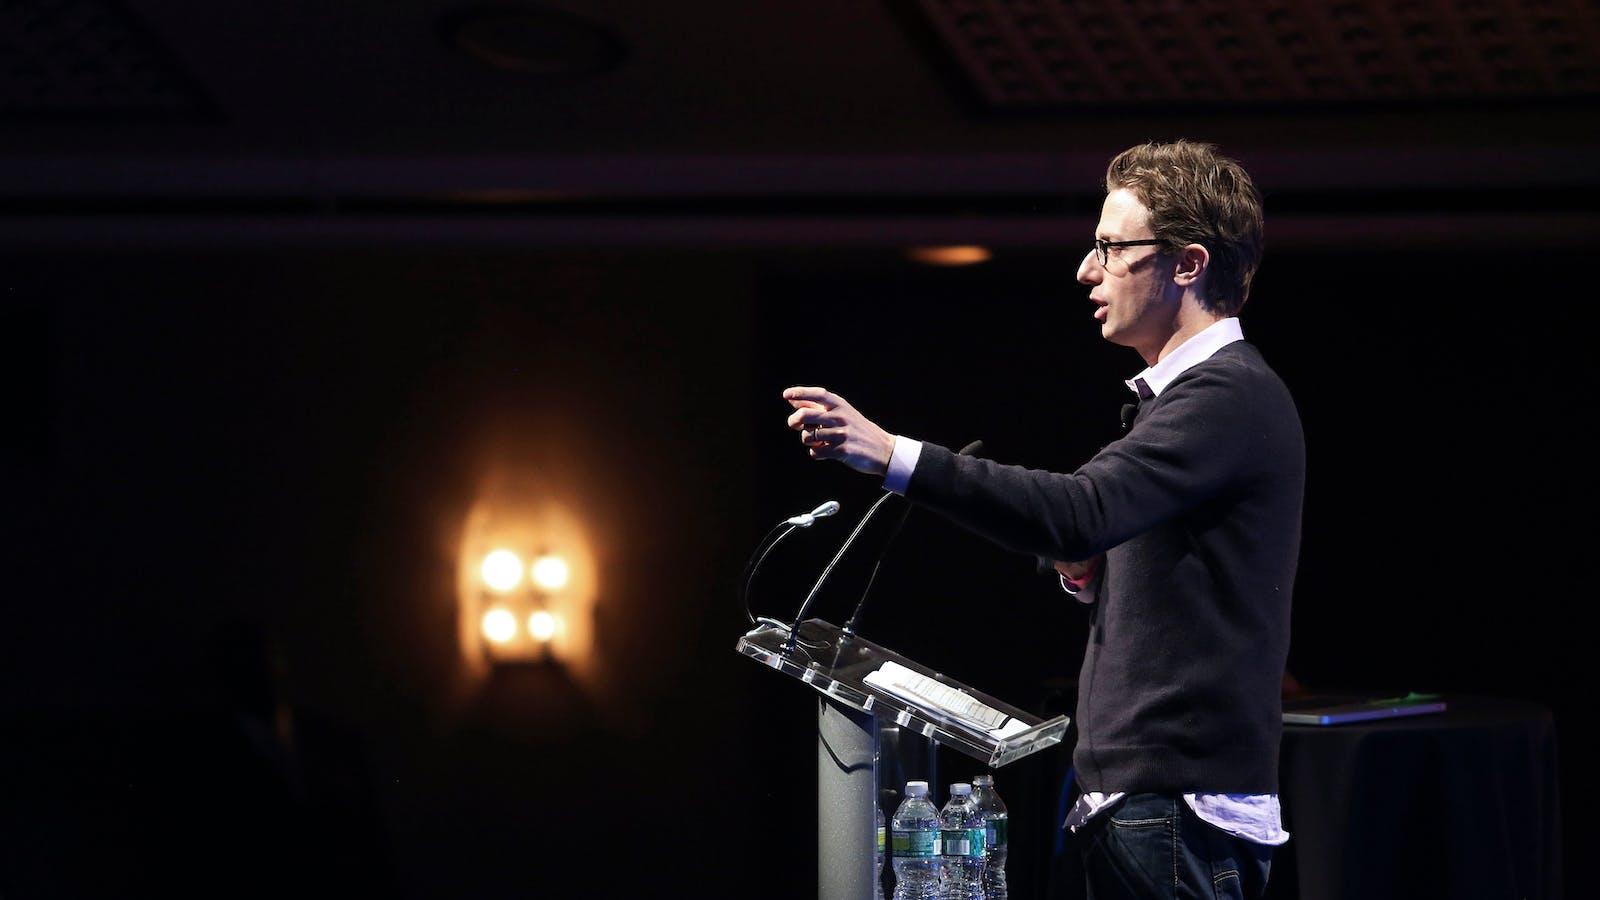 Buzzfeed CEO Jonah Peretti. Photo by Flickr/TechCrunch/Max Morse.